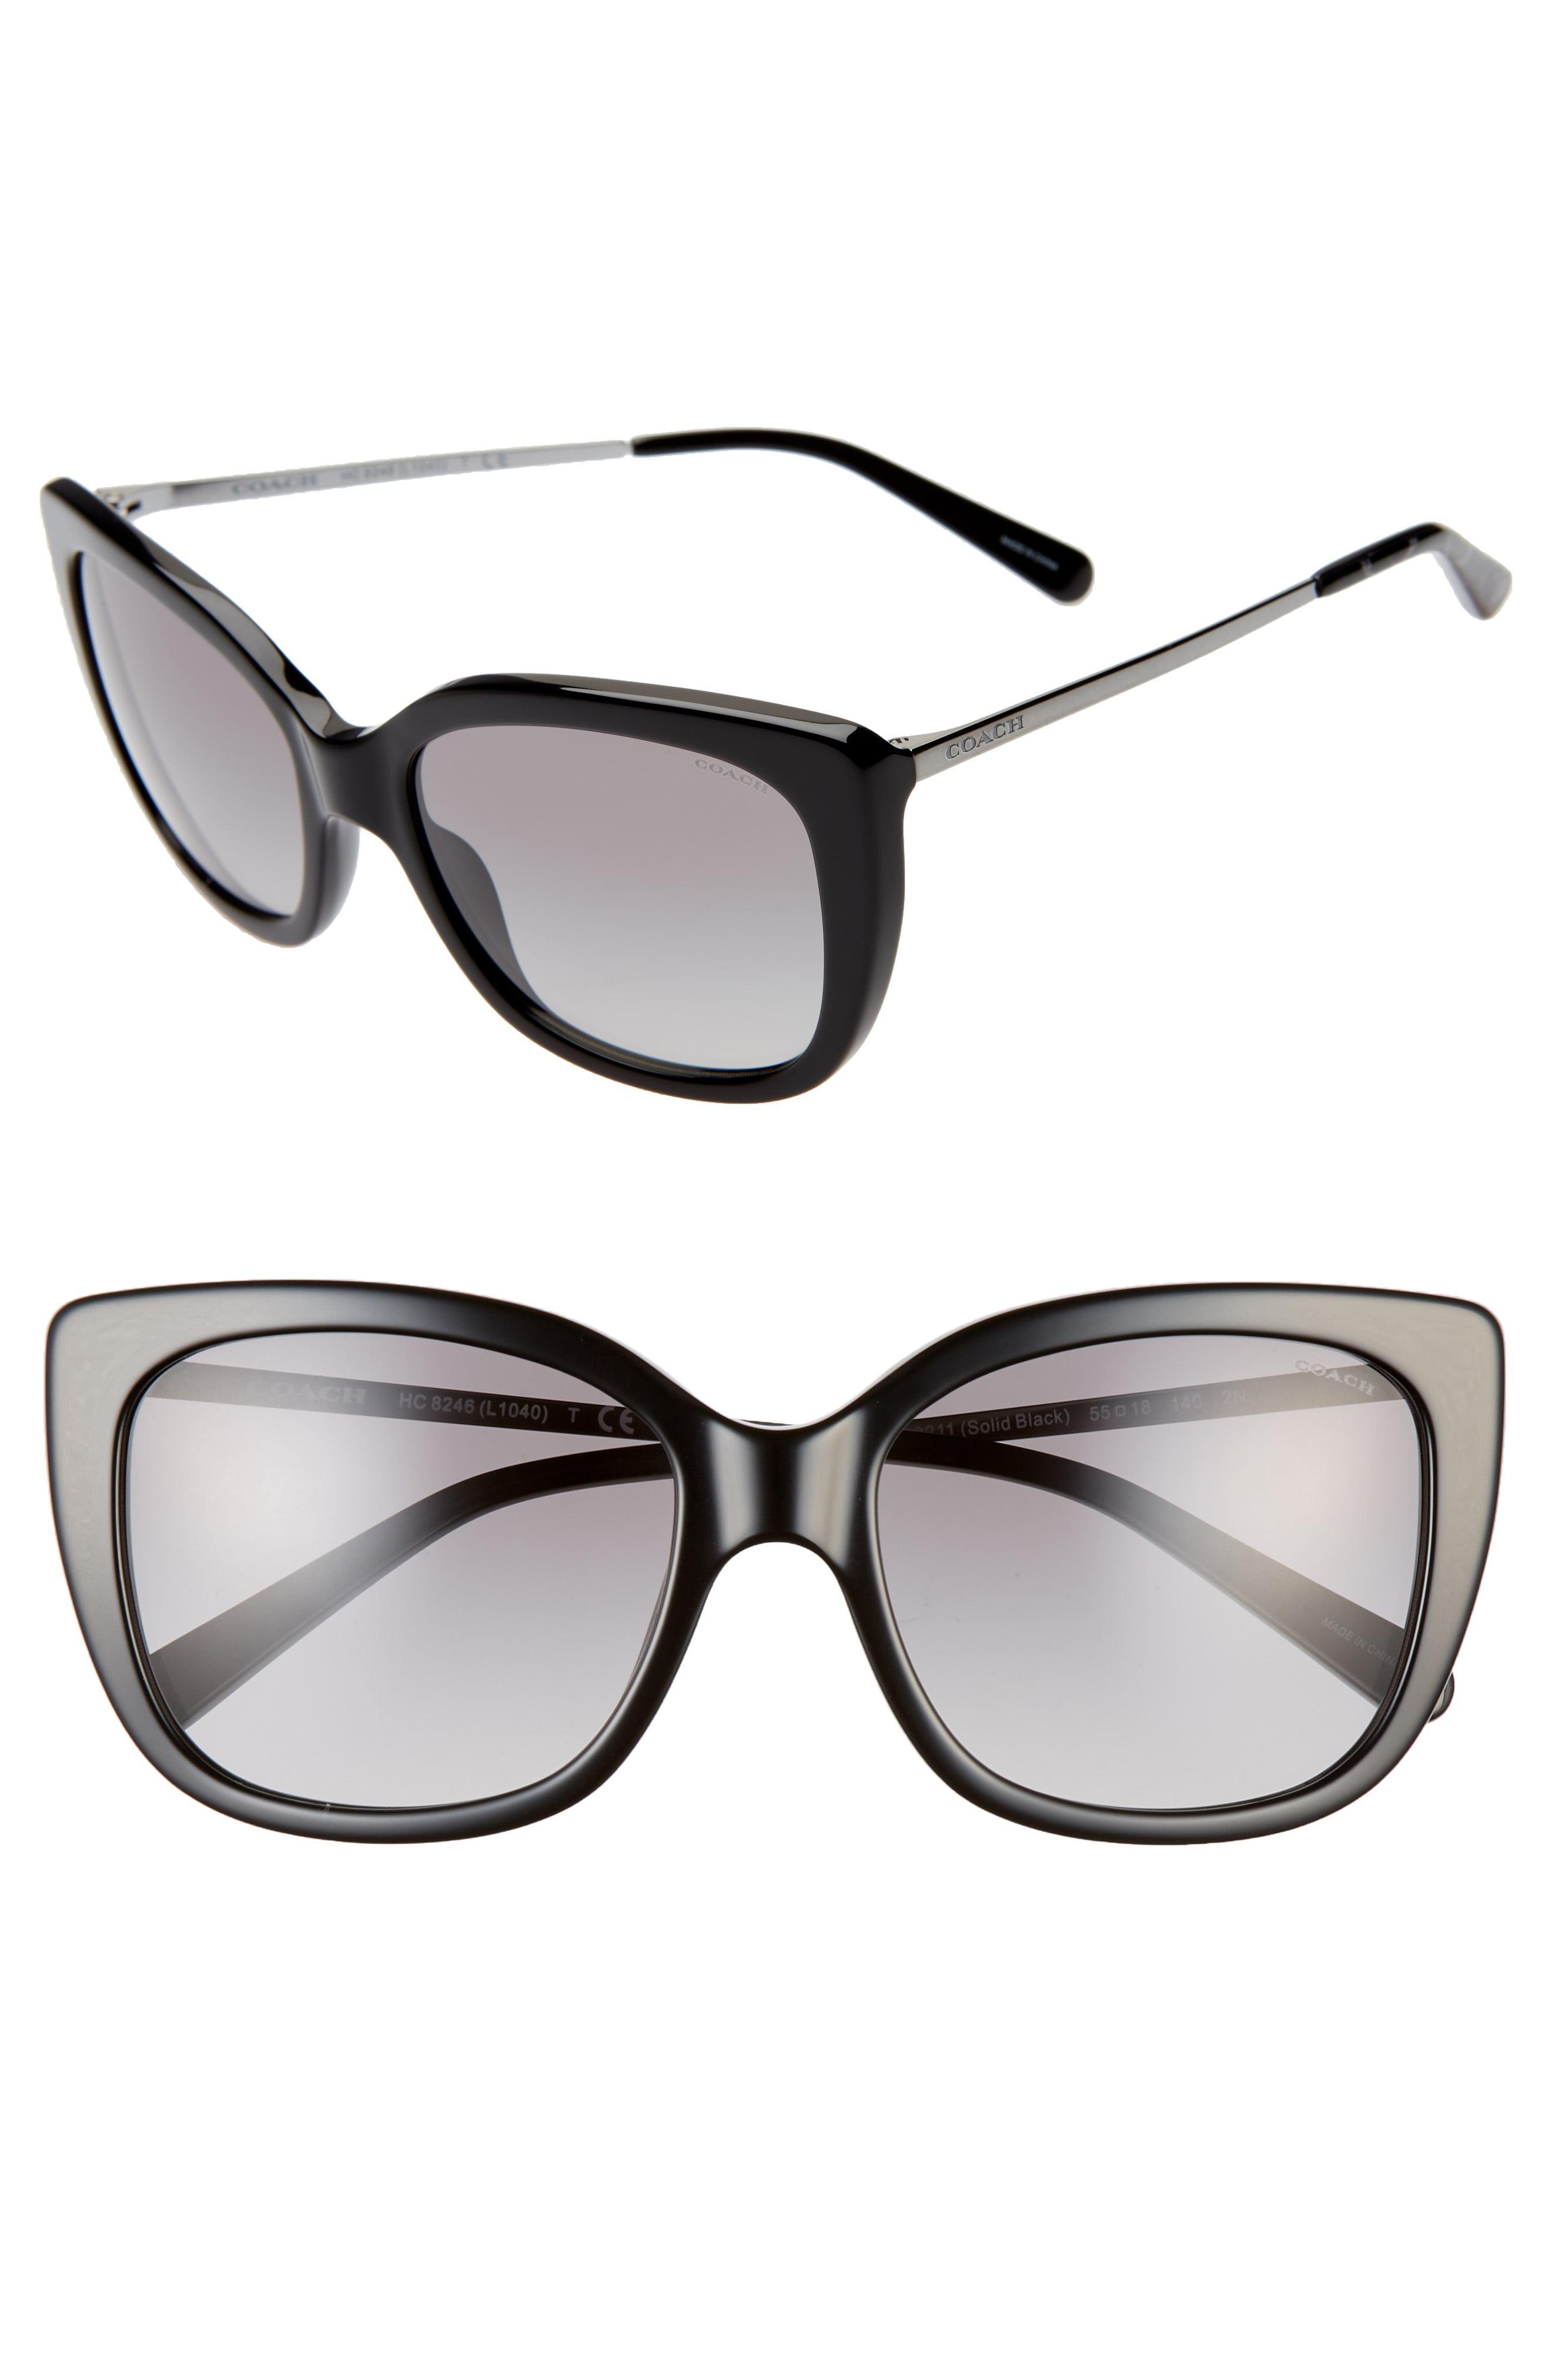 4d003a1238 COACH - Black 55mm Cat Eye Sunglasses - Lyst. View fullscreen